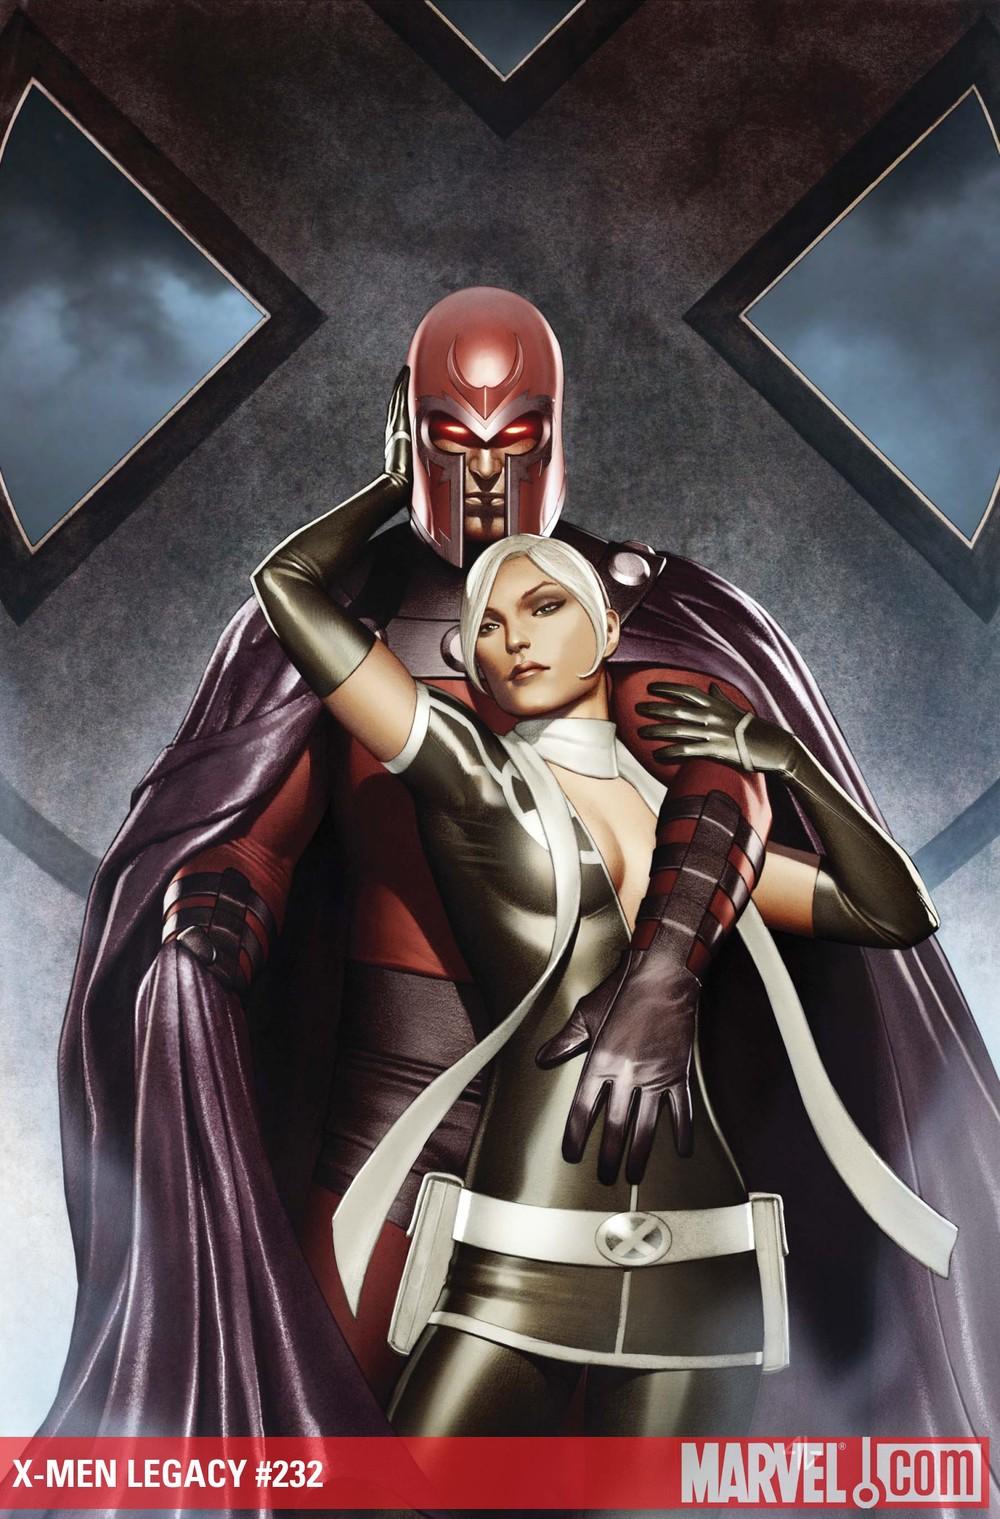 x-men-legacy-cover.jpg